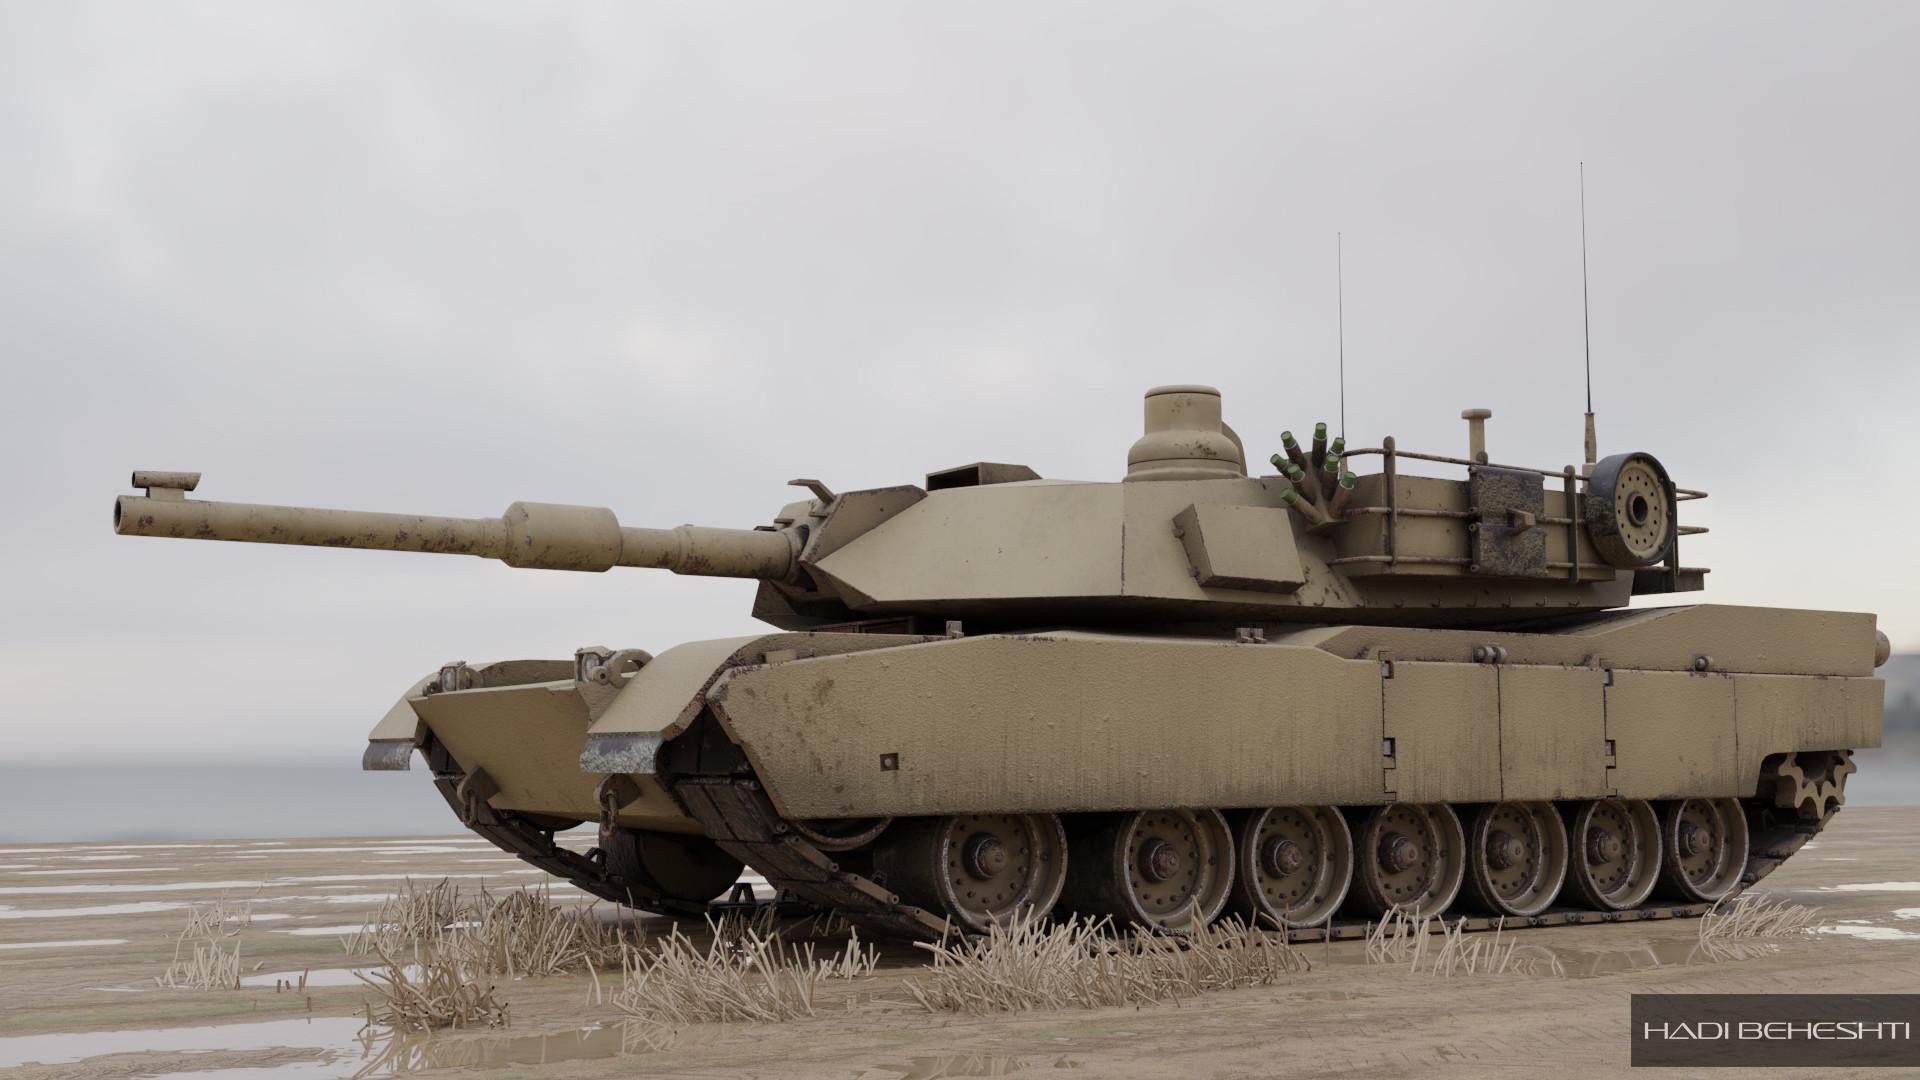 Hadi beheshti tankblender 2